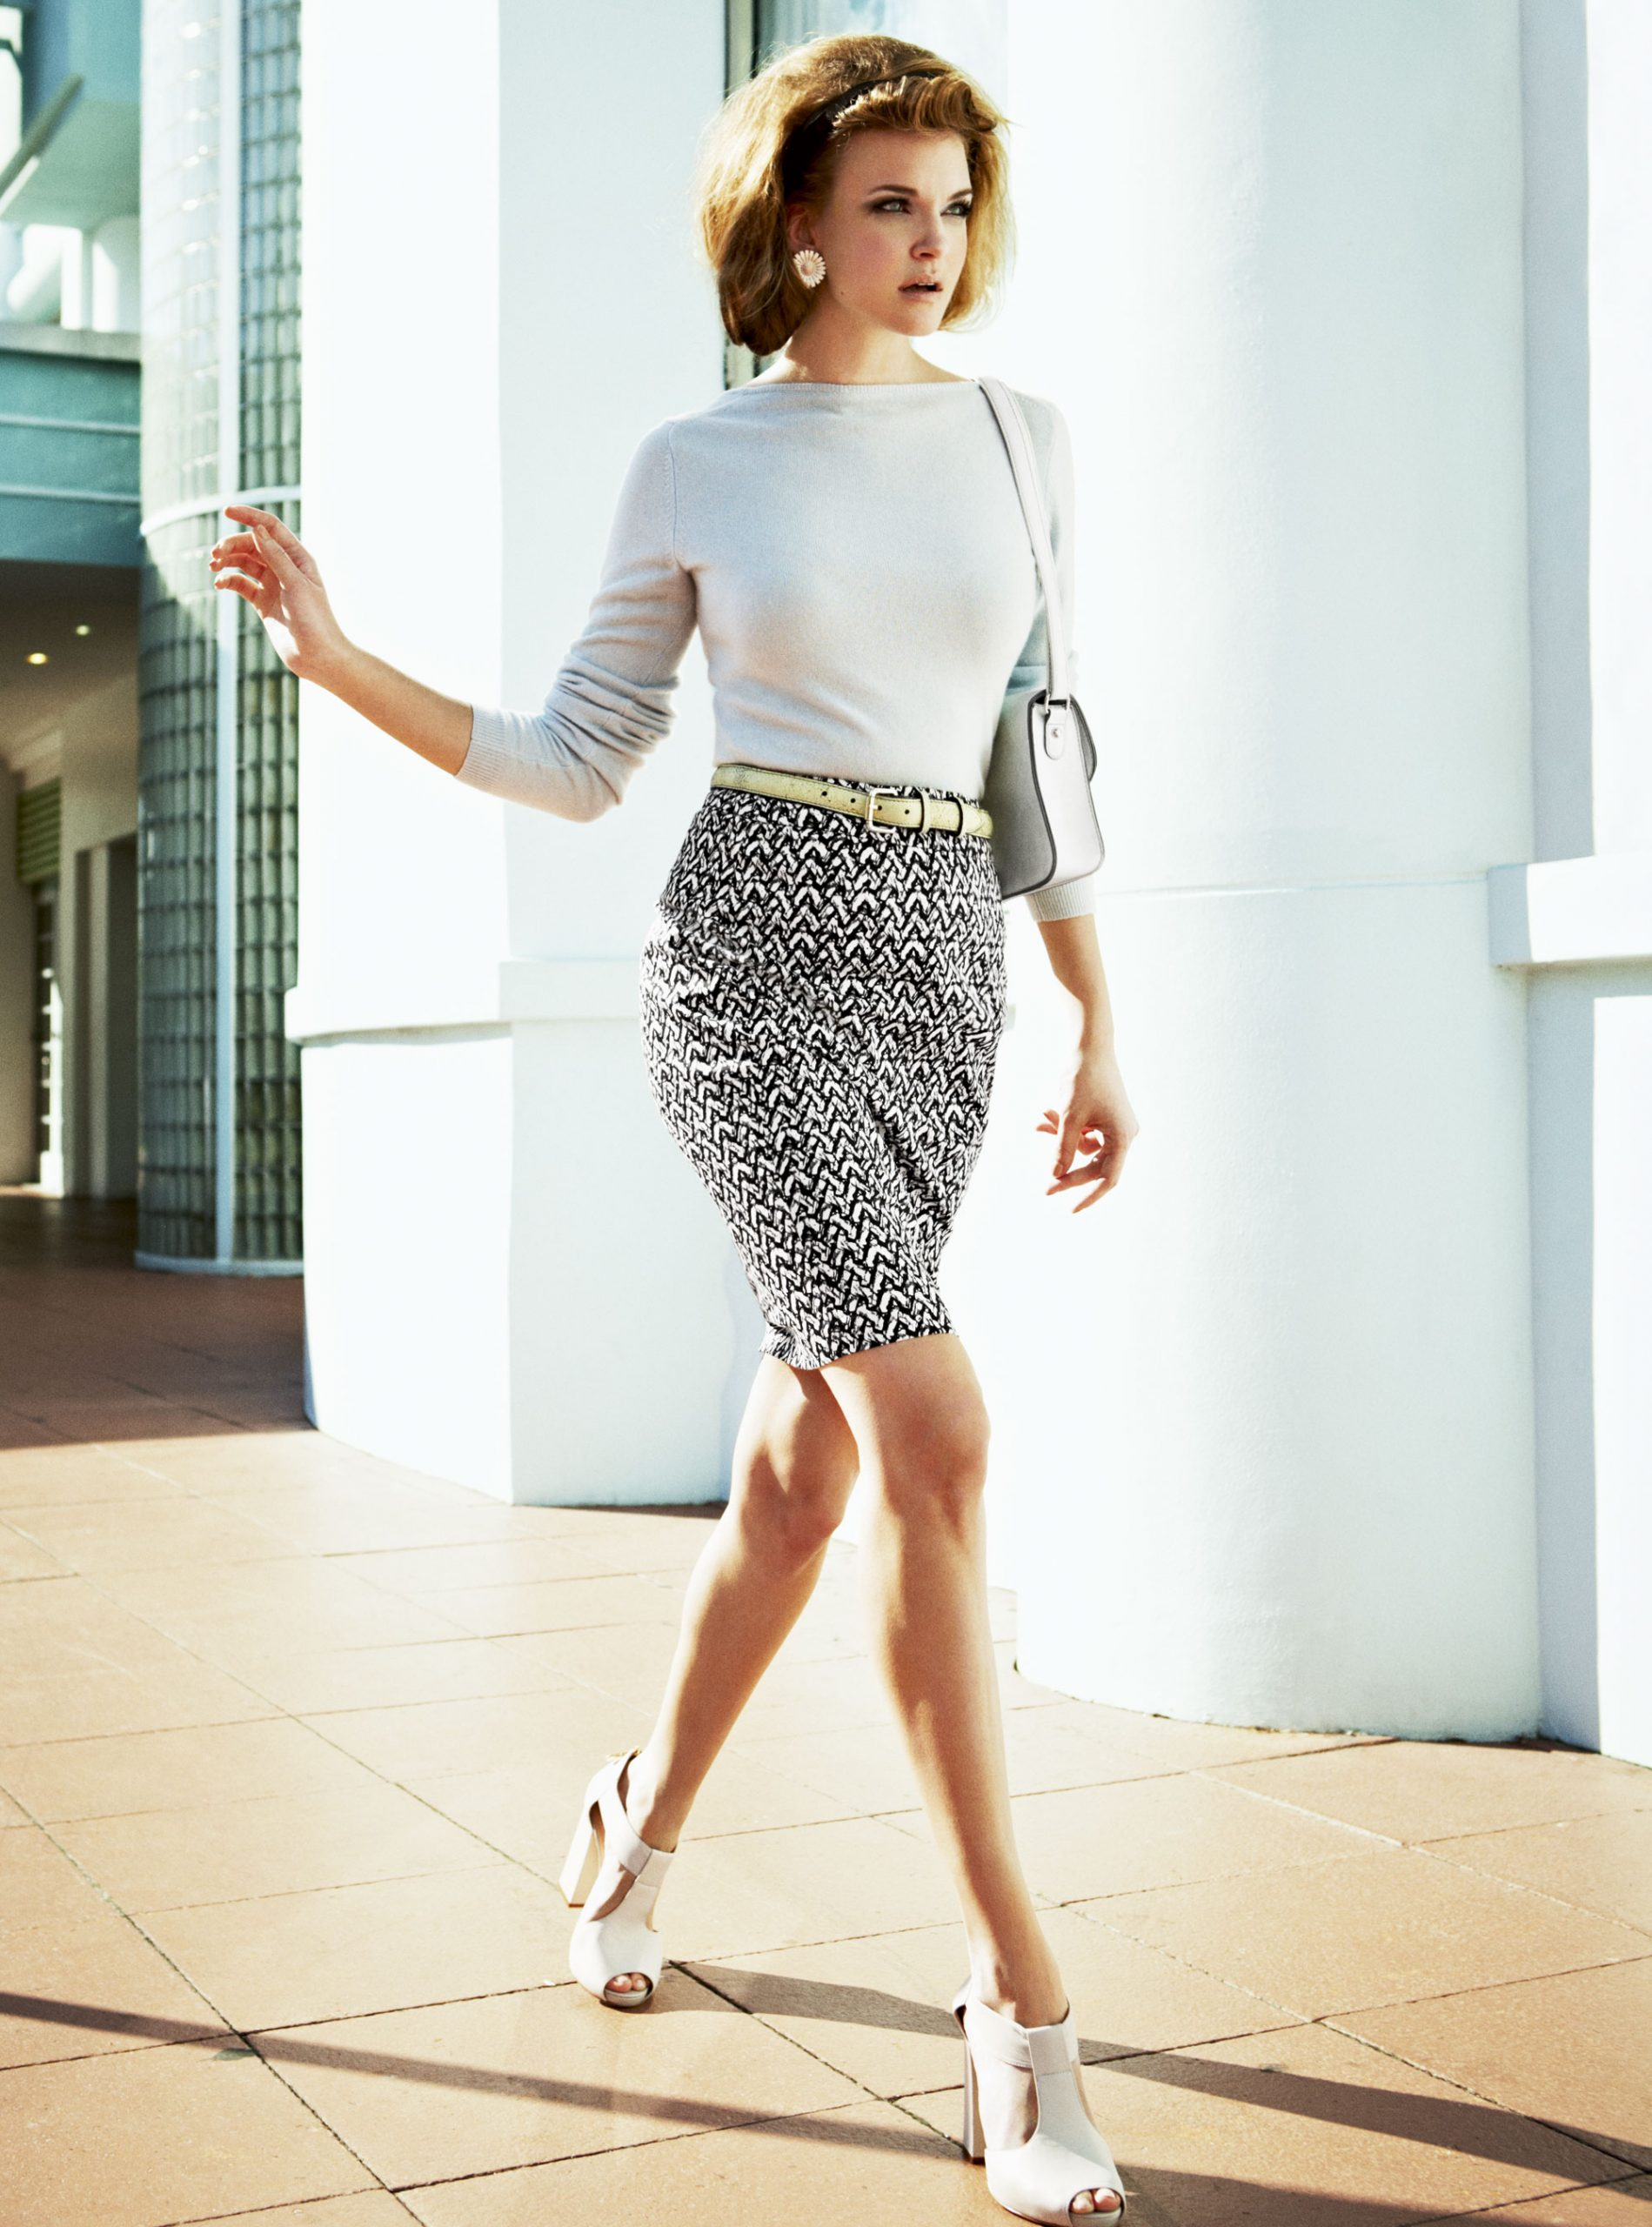 model wearing spring fashion photo